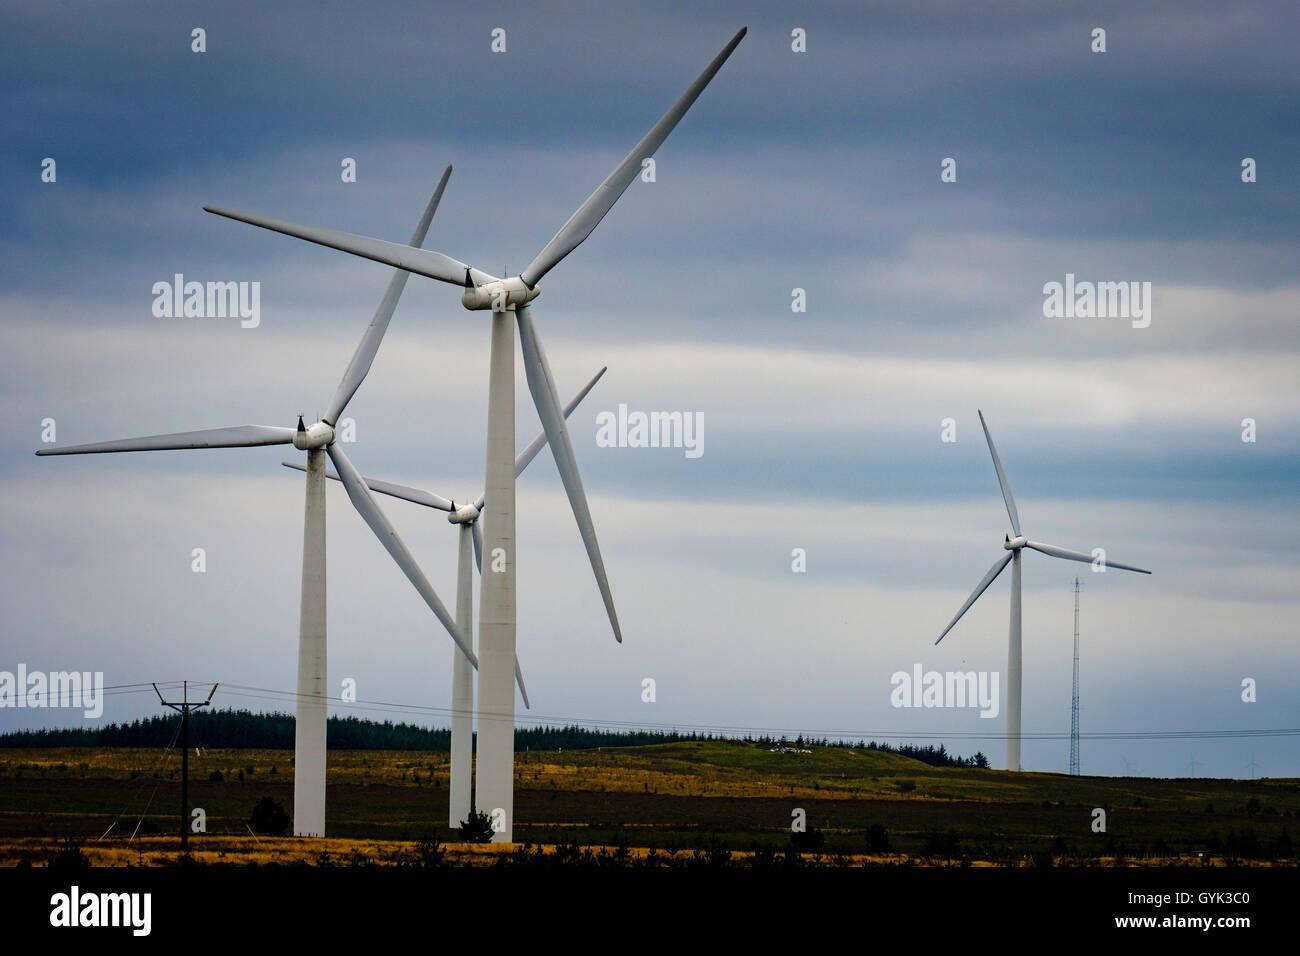 Wind turbines on the Black Law Wind Farm, South Lanarkshire, Scotland - Stock Image